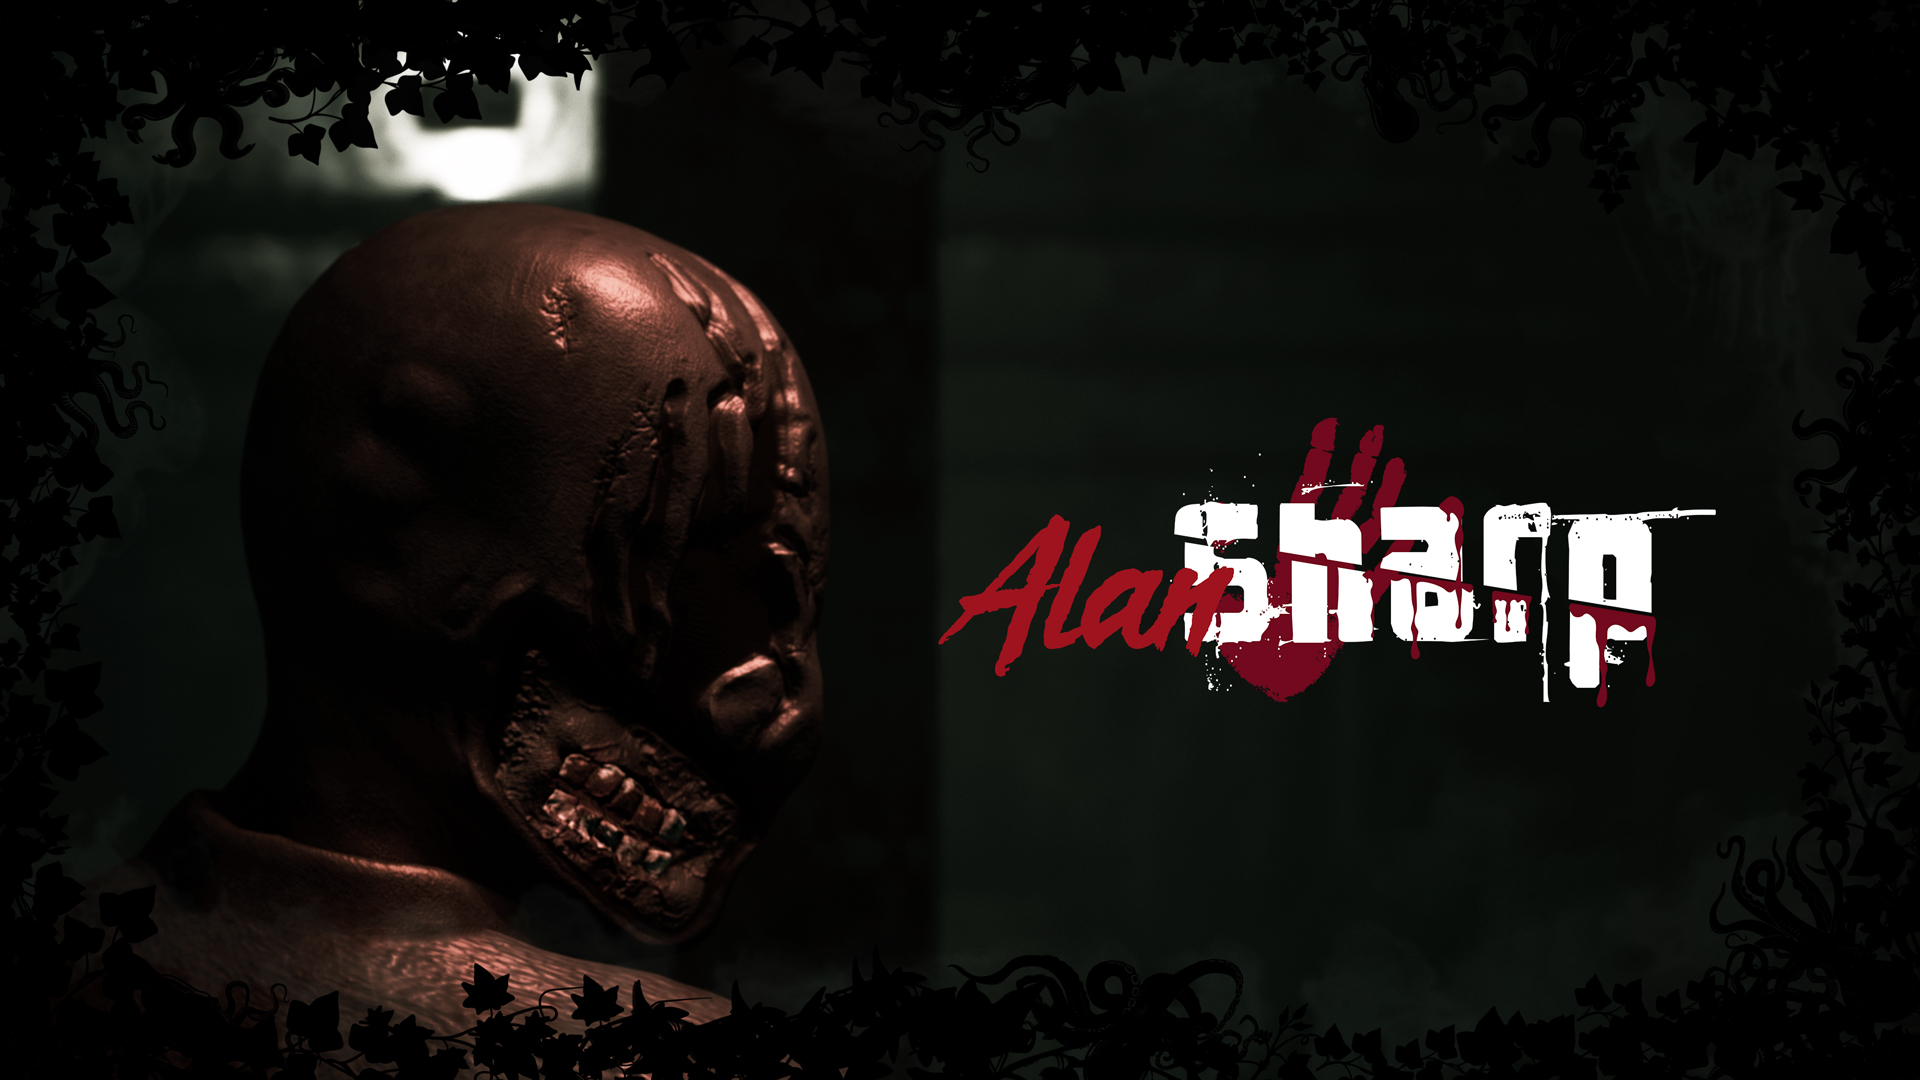 Alan Sharp Sewer Demon